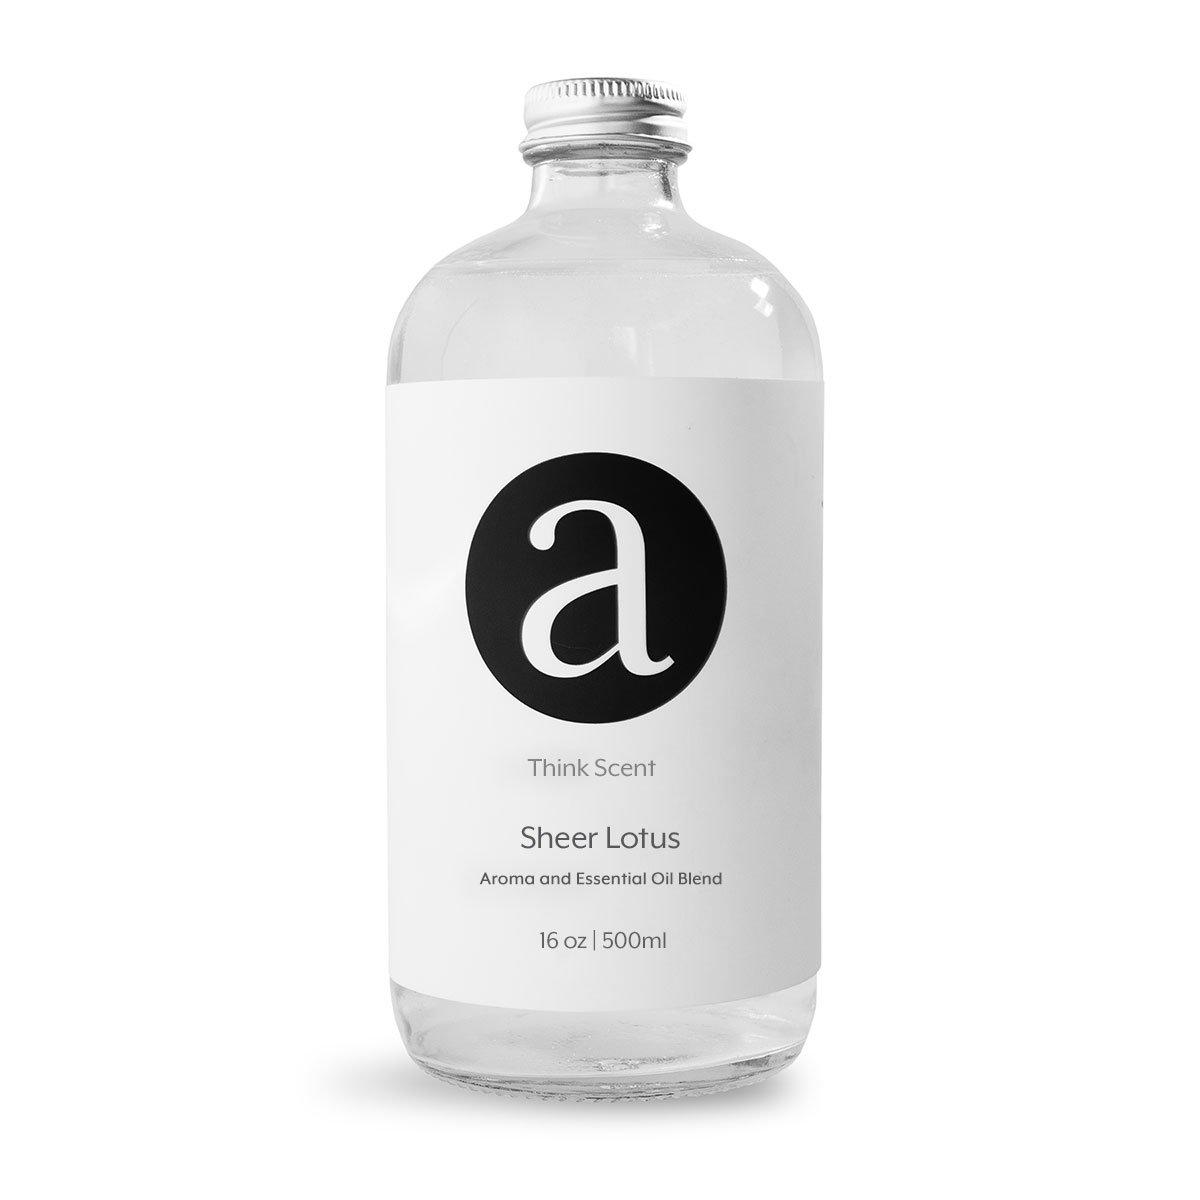 (Sheer Lotus) Aroma / Fragrance Oil For AromaTech Air Freshener Scent Diffuser (500ml)